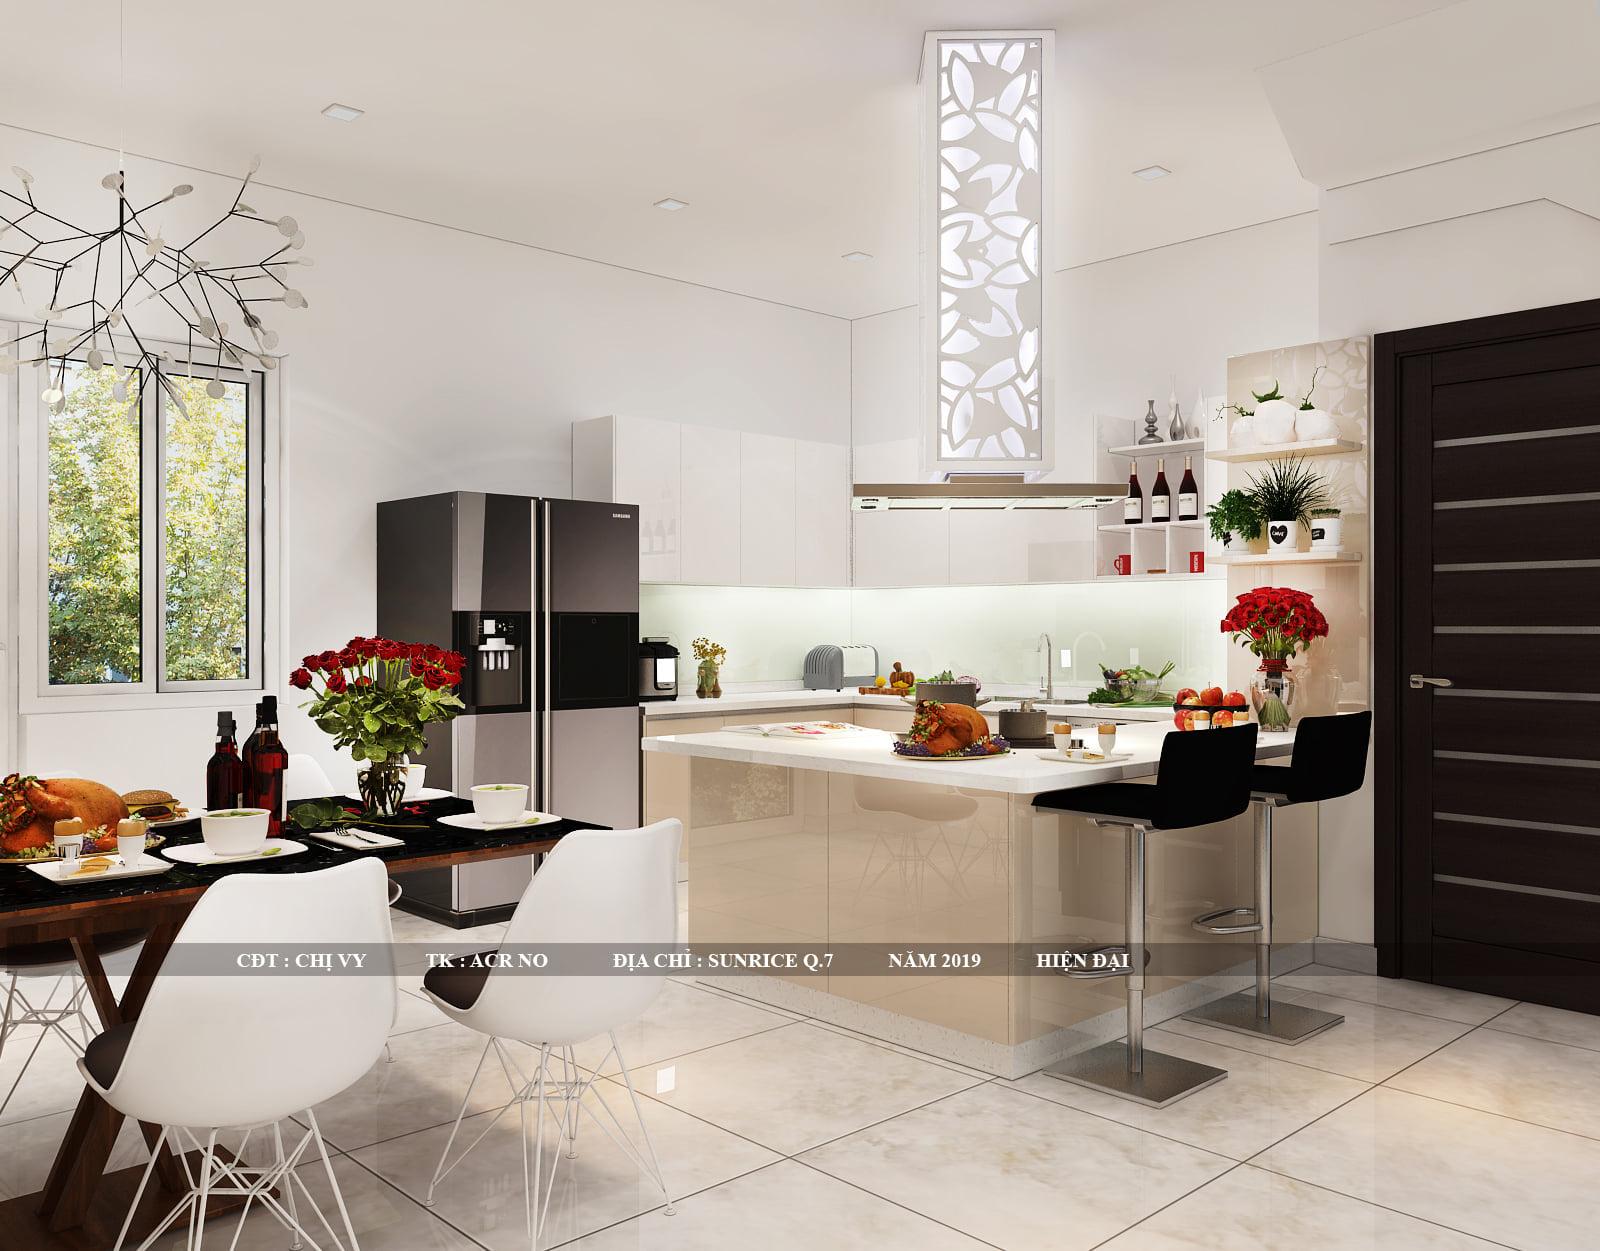 Mẫu thiết kế nội thất Crittal